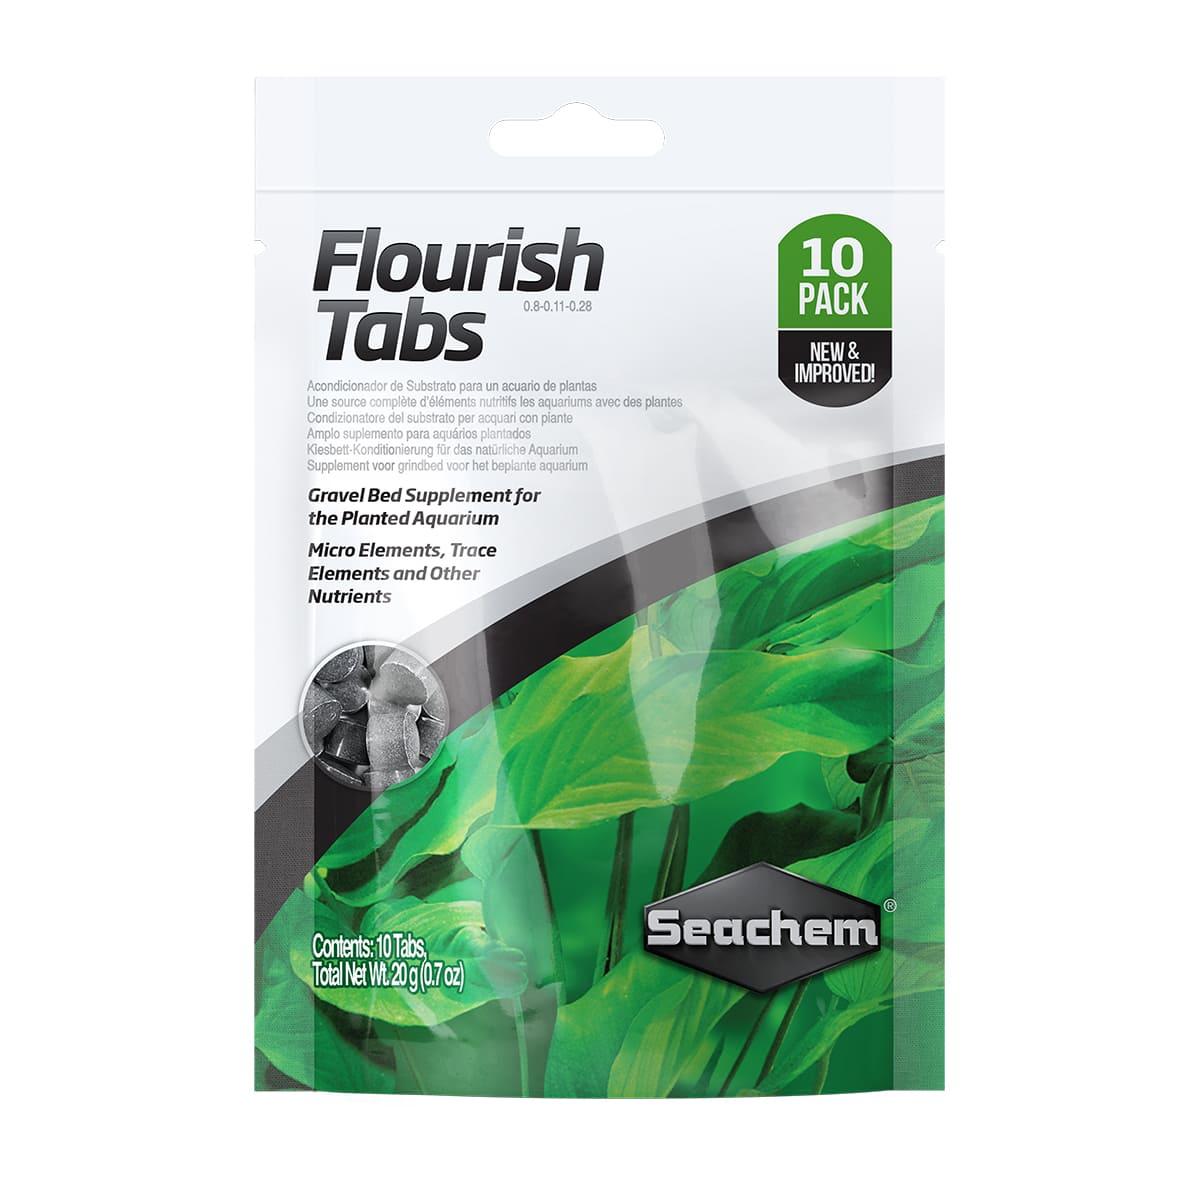 Seachem Flourish Tabs Fertilizante p Plantados 10 Pastilhas